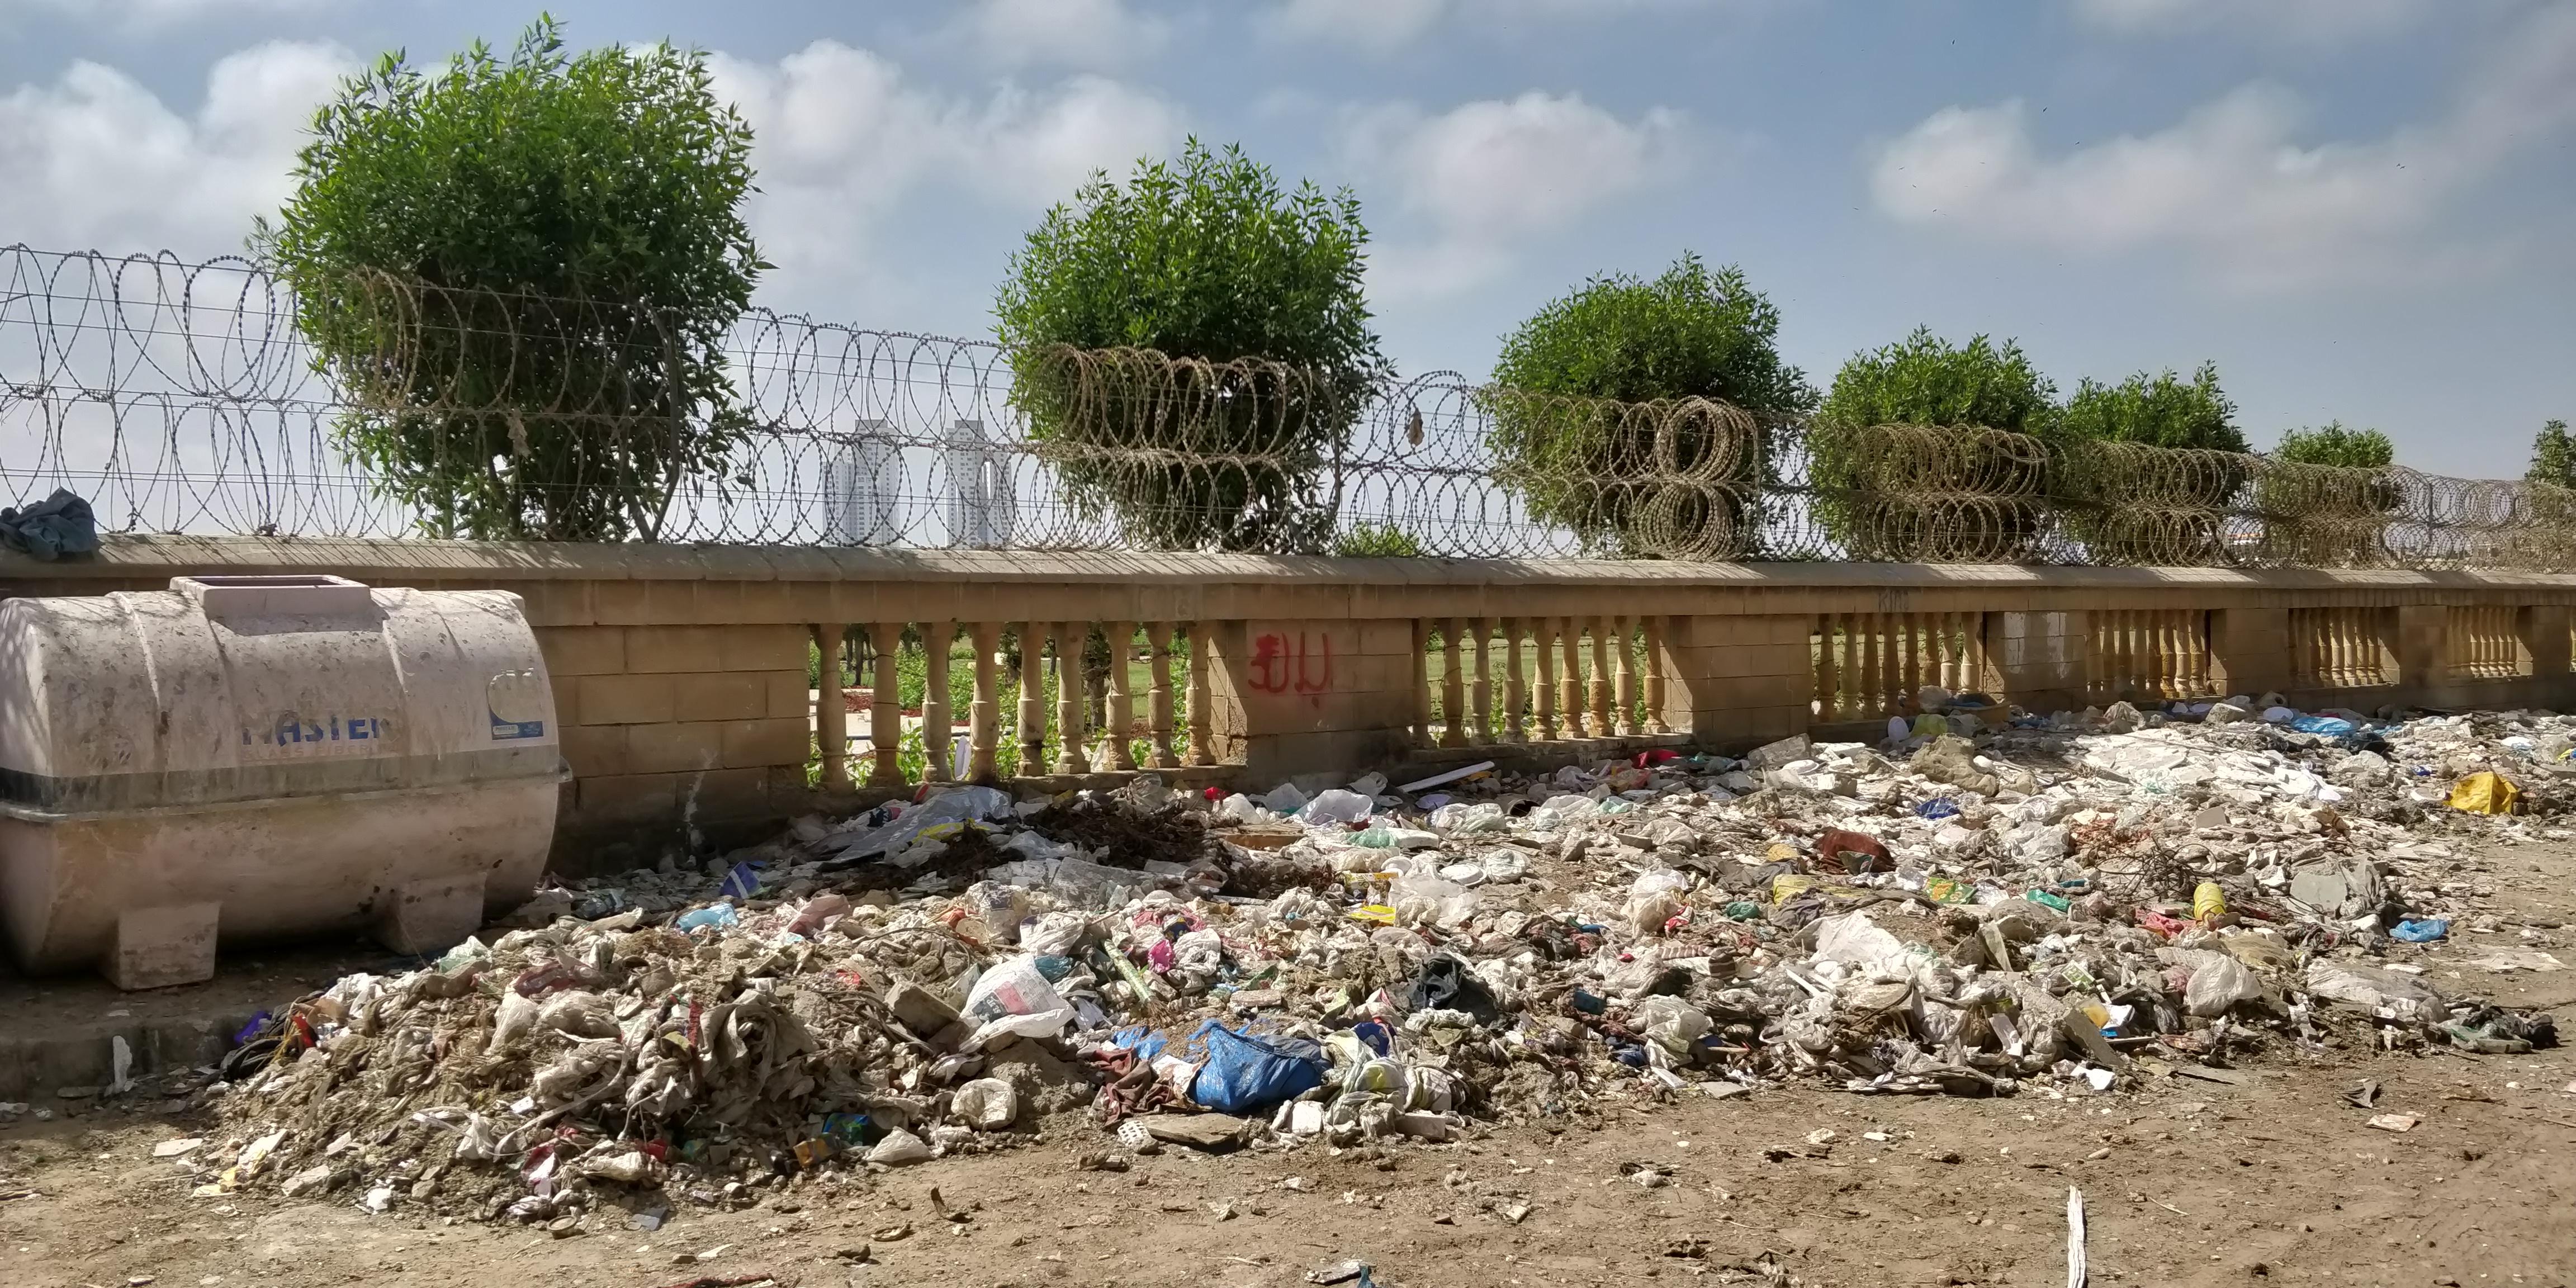 Street rubbish in Pakistan